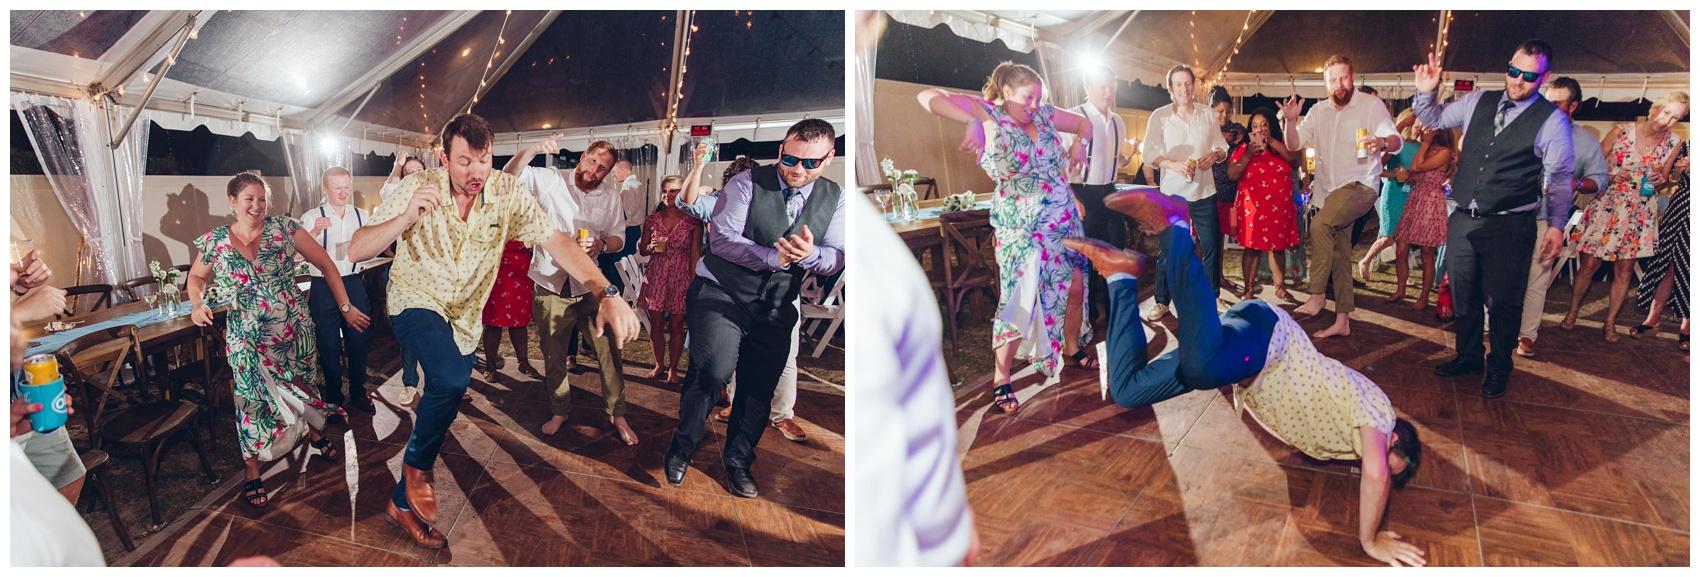 Outer-Banks-Corolla-Wedding_0127.jpg